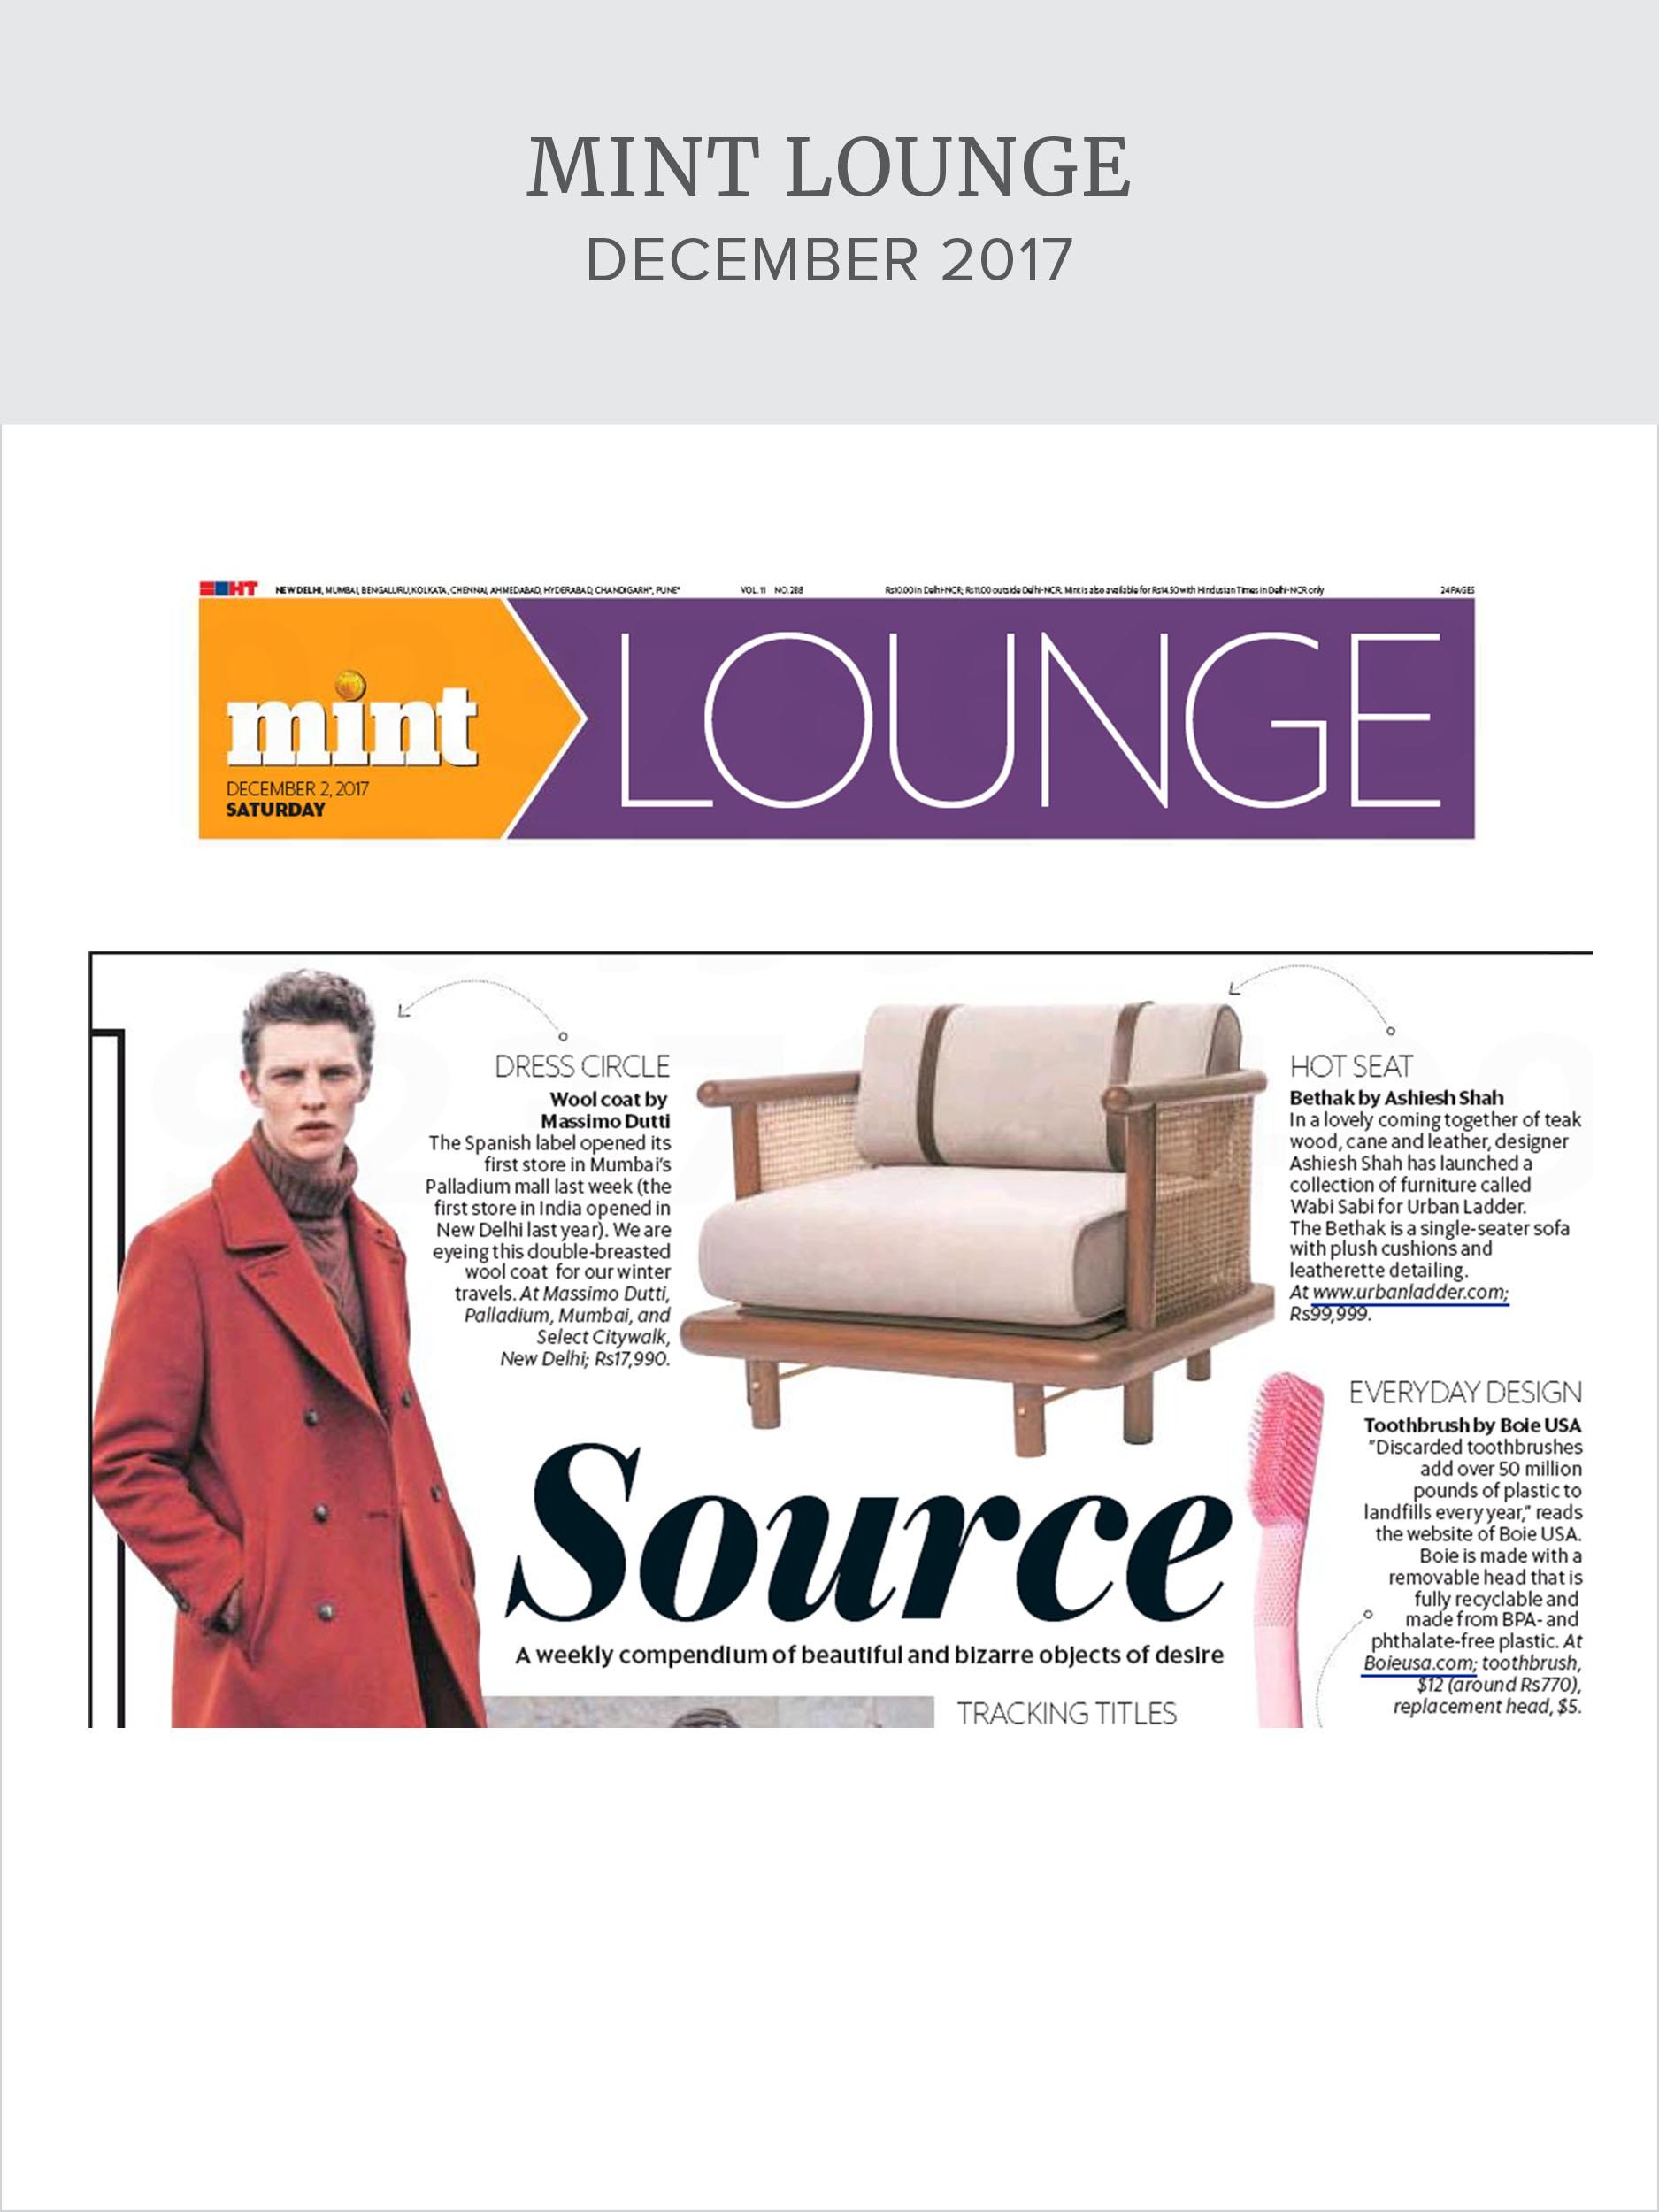 mint lounge article.jpg